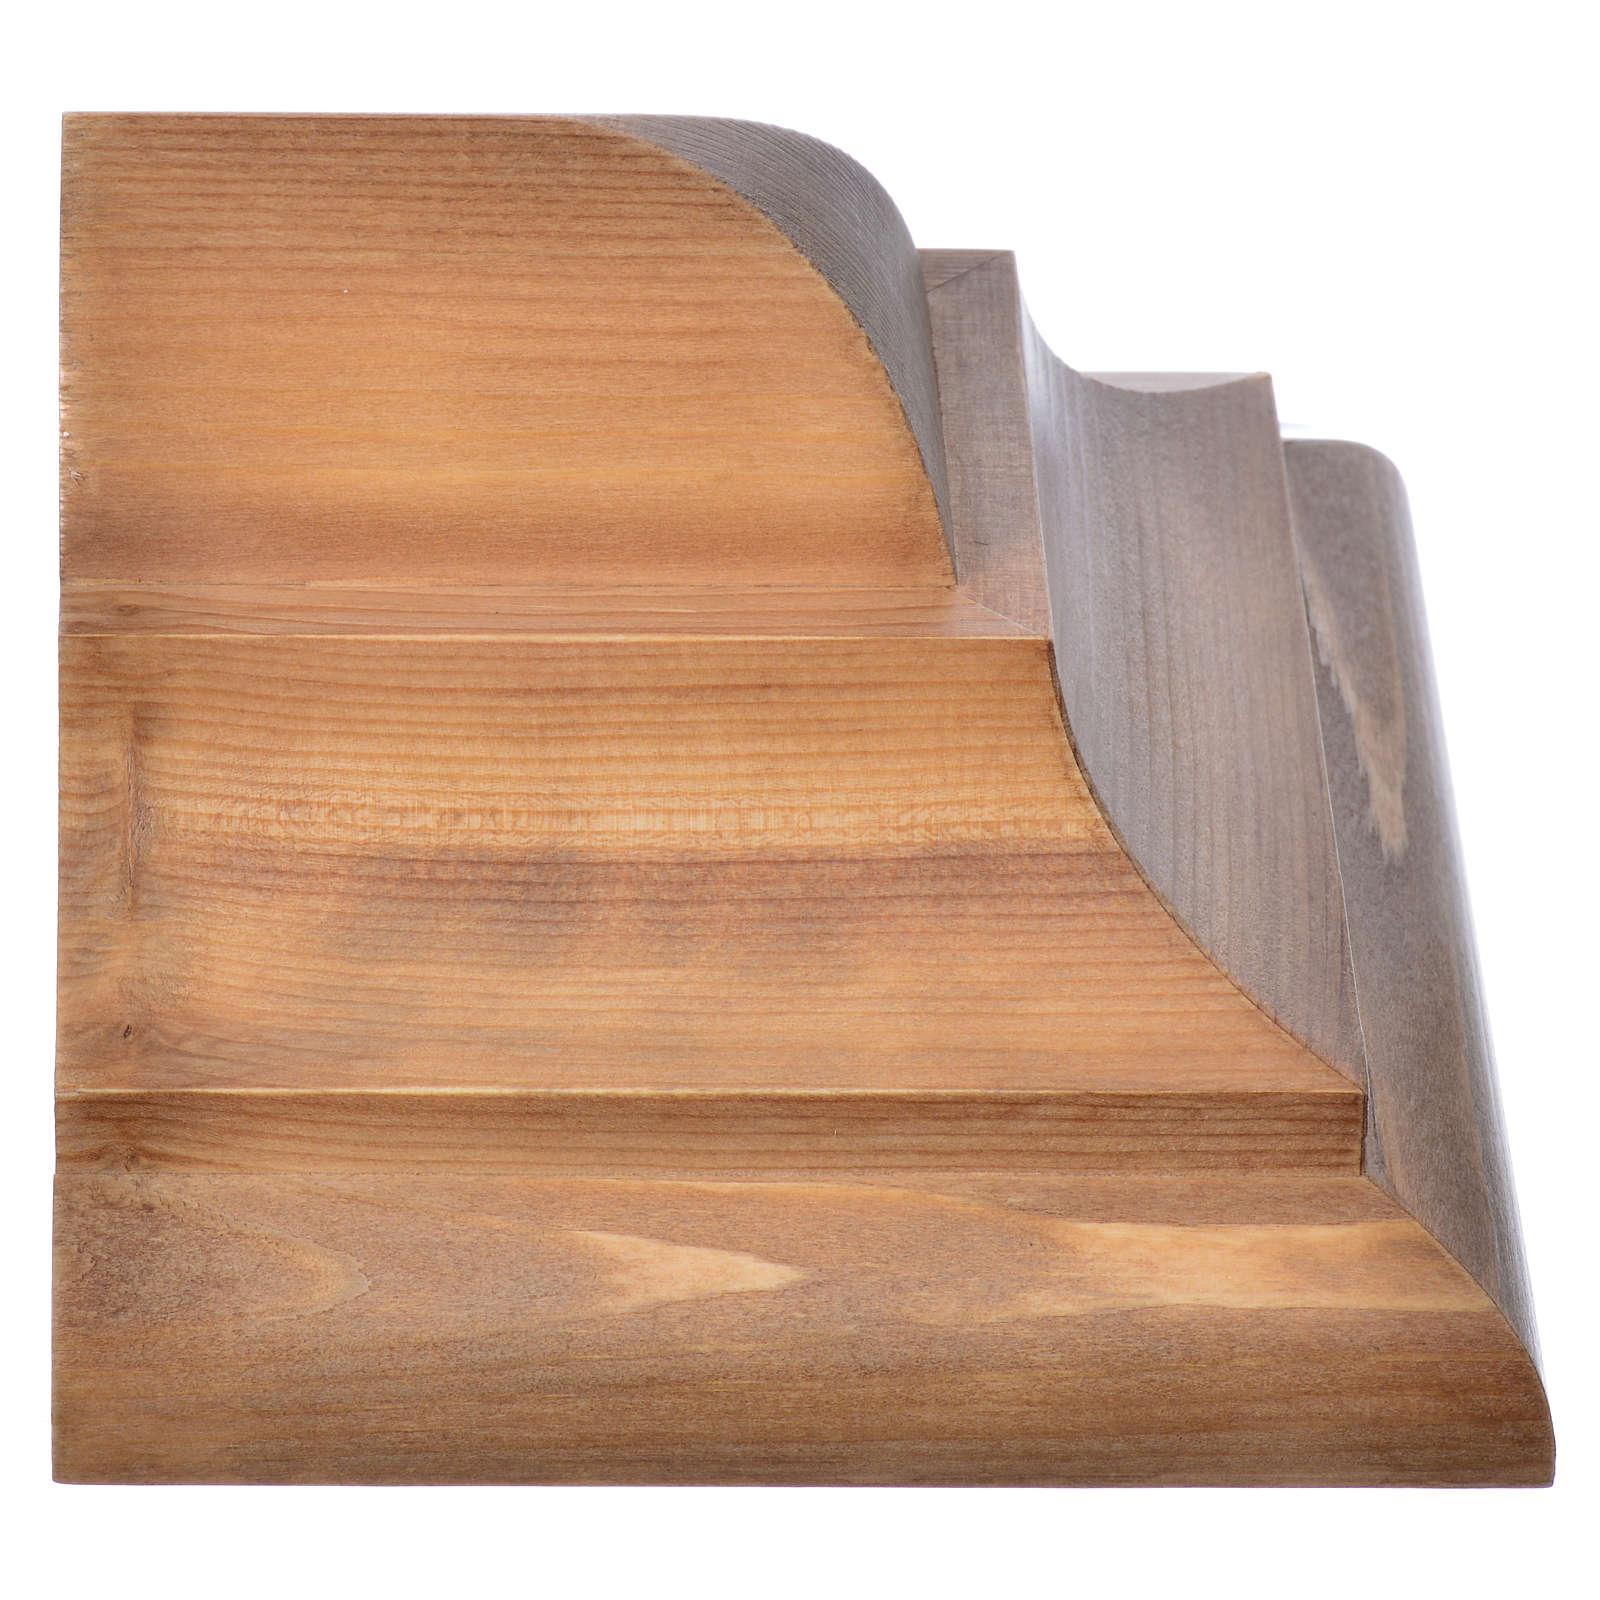 Ménsula pared gótica de madera Valgardena patinada 4